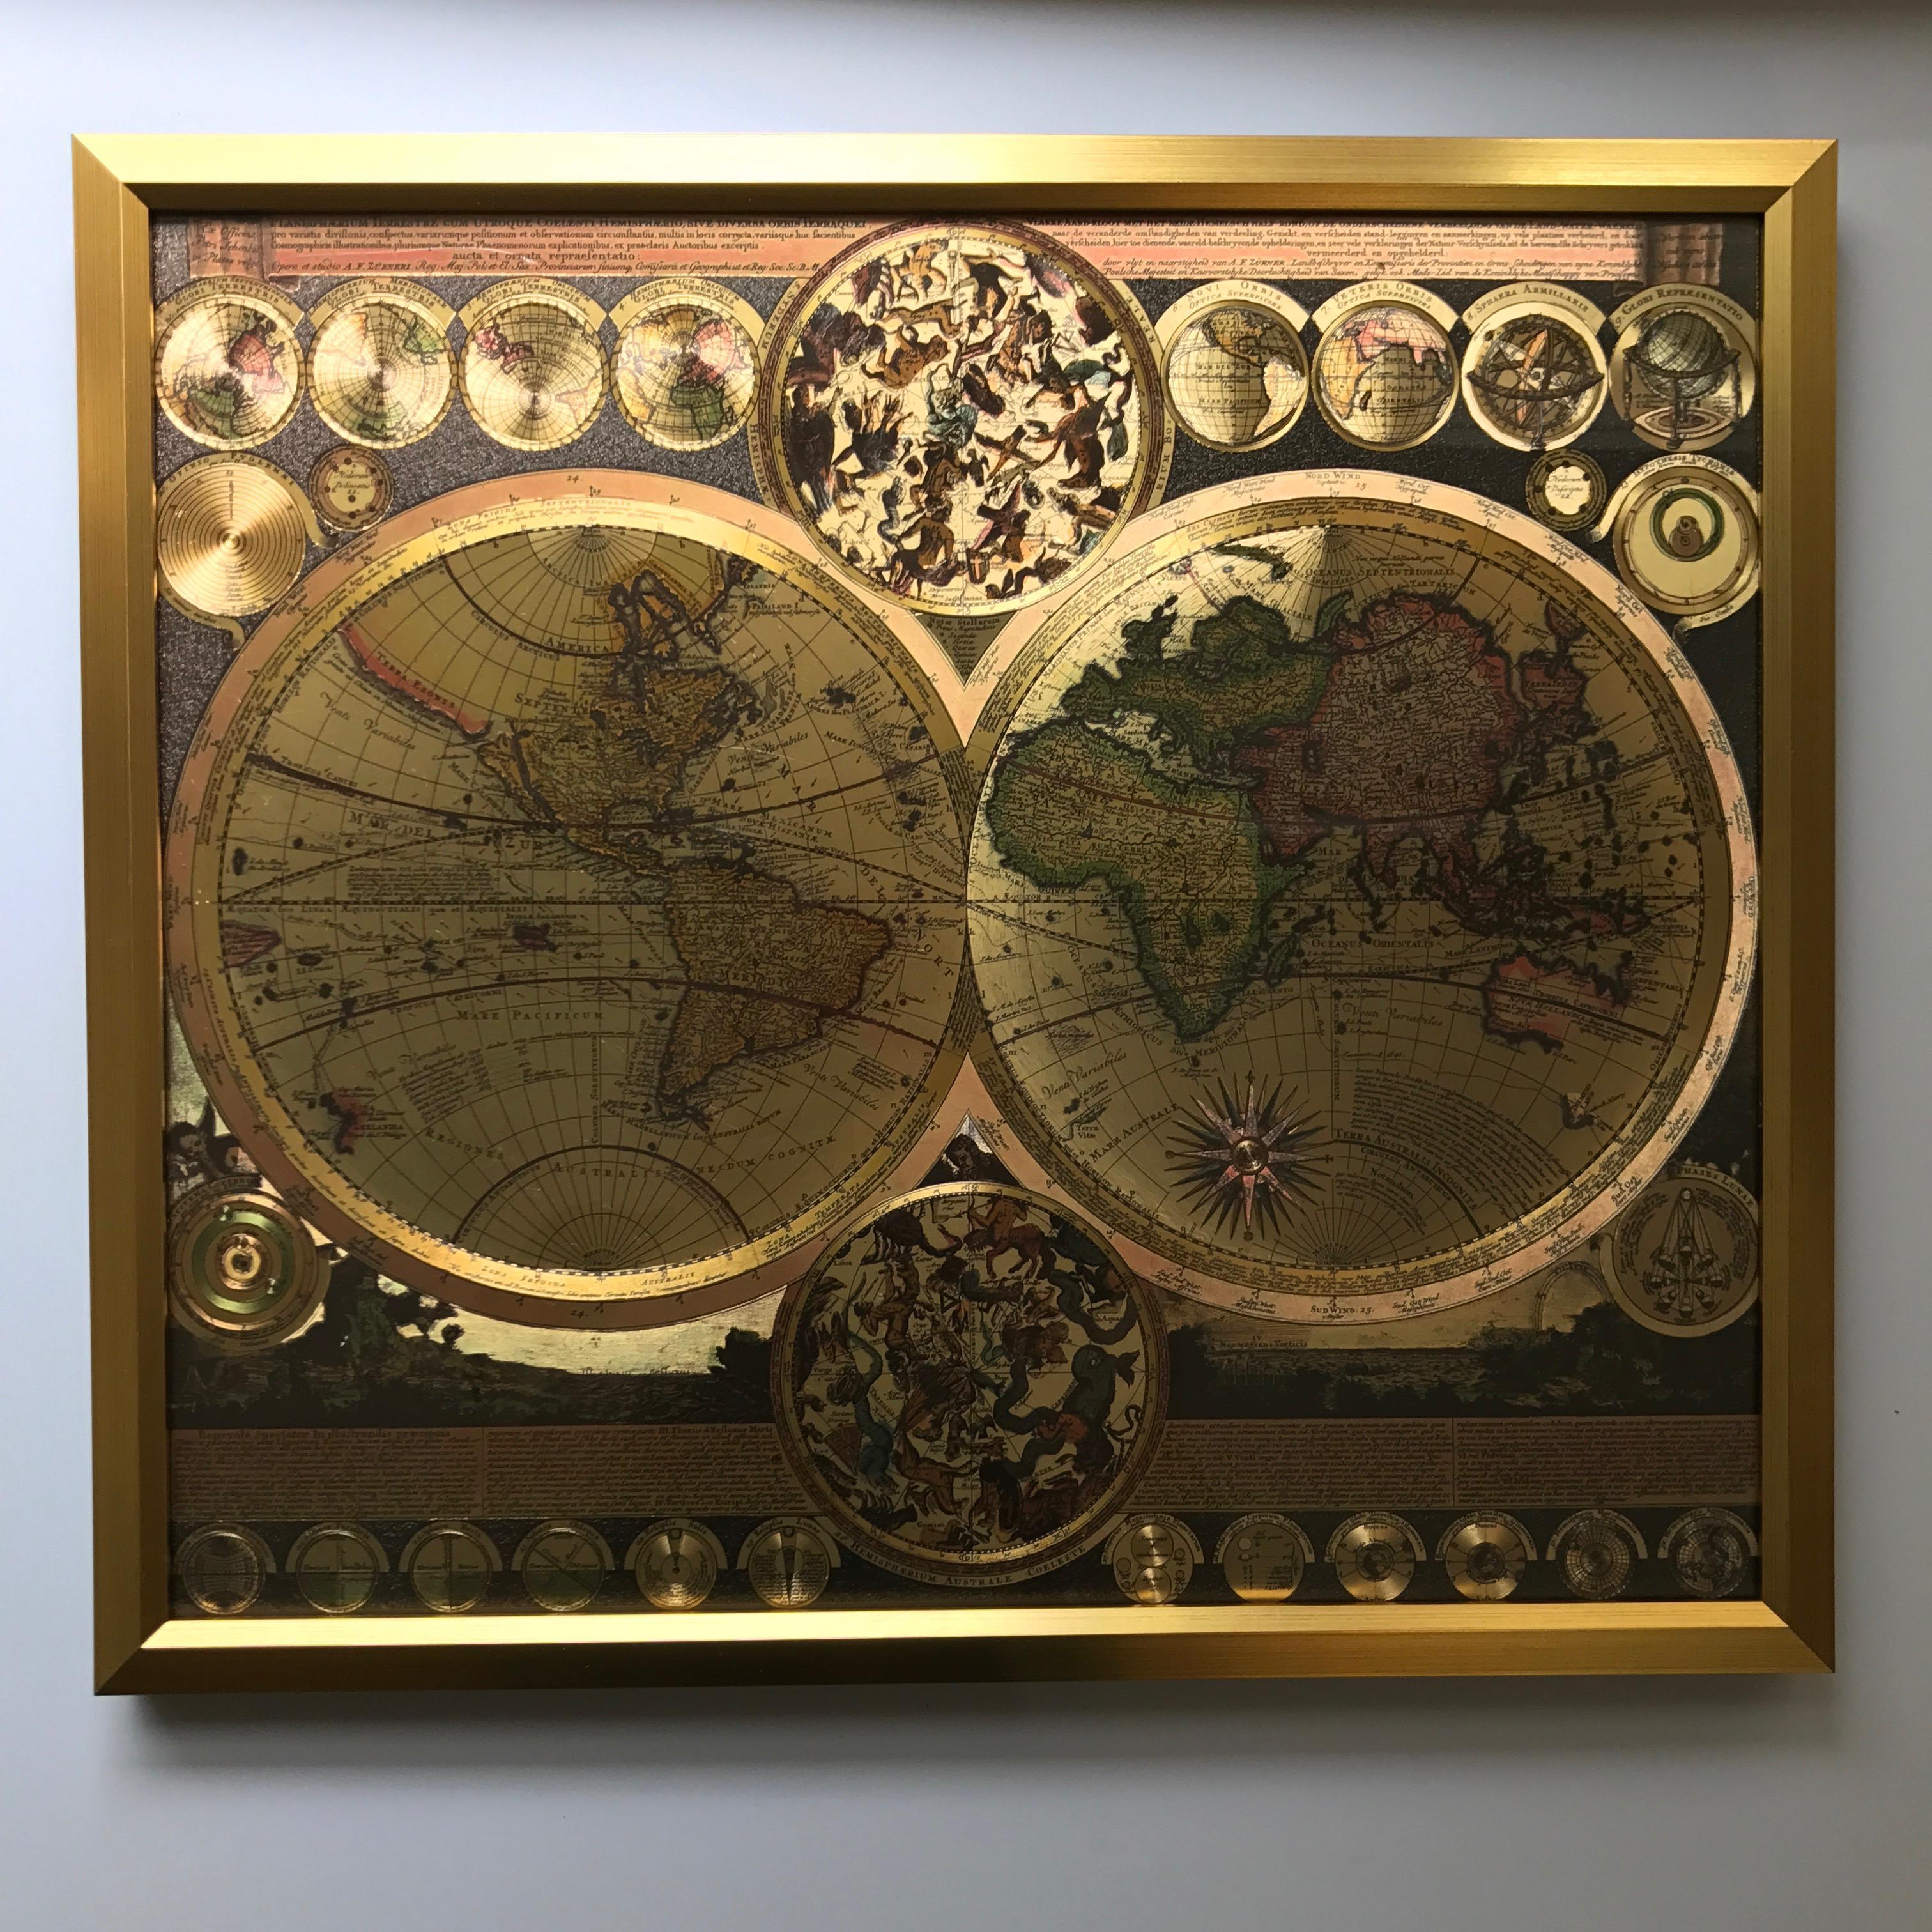 Gold Foil World Map Framed.Framed Gold Foil World Map Print Chairish